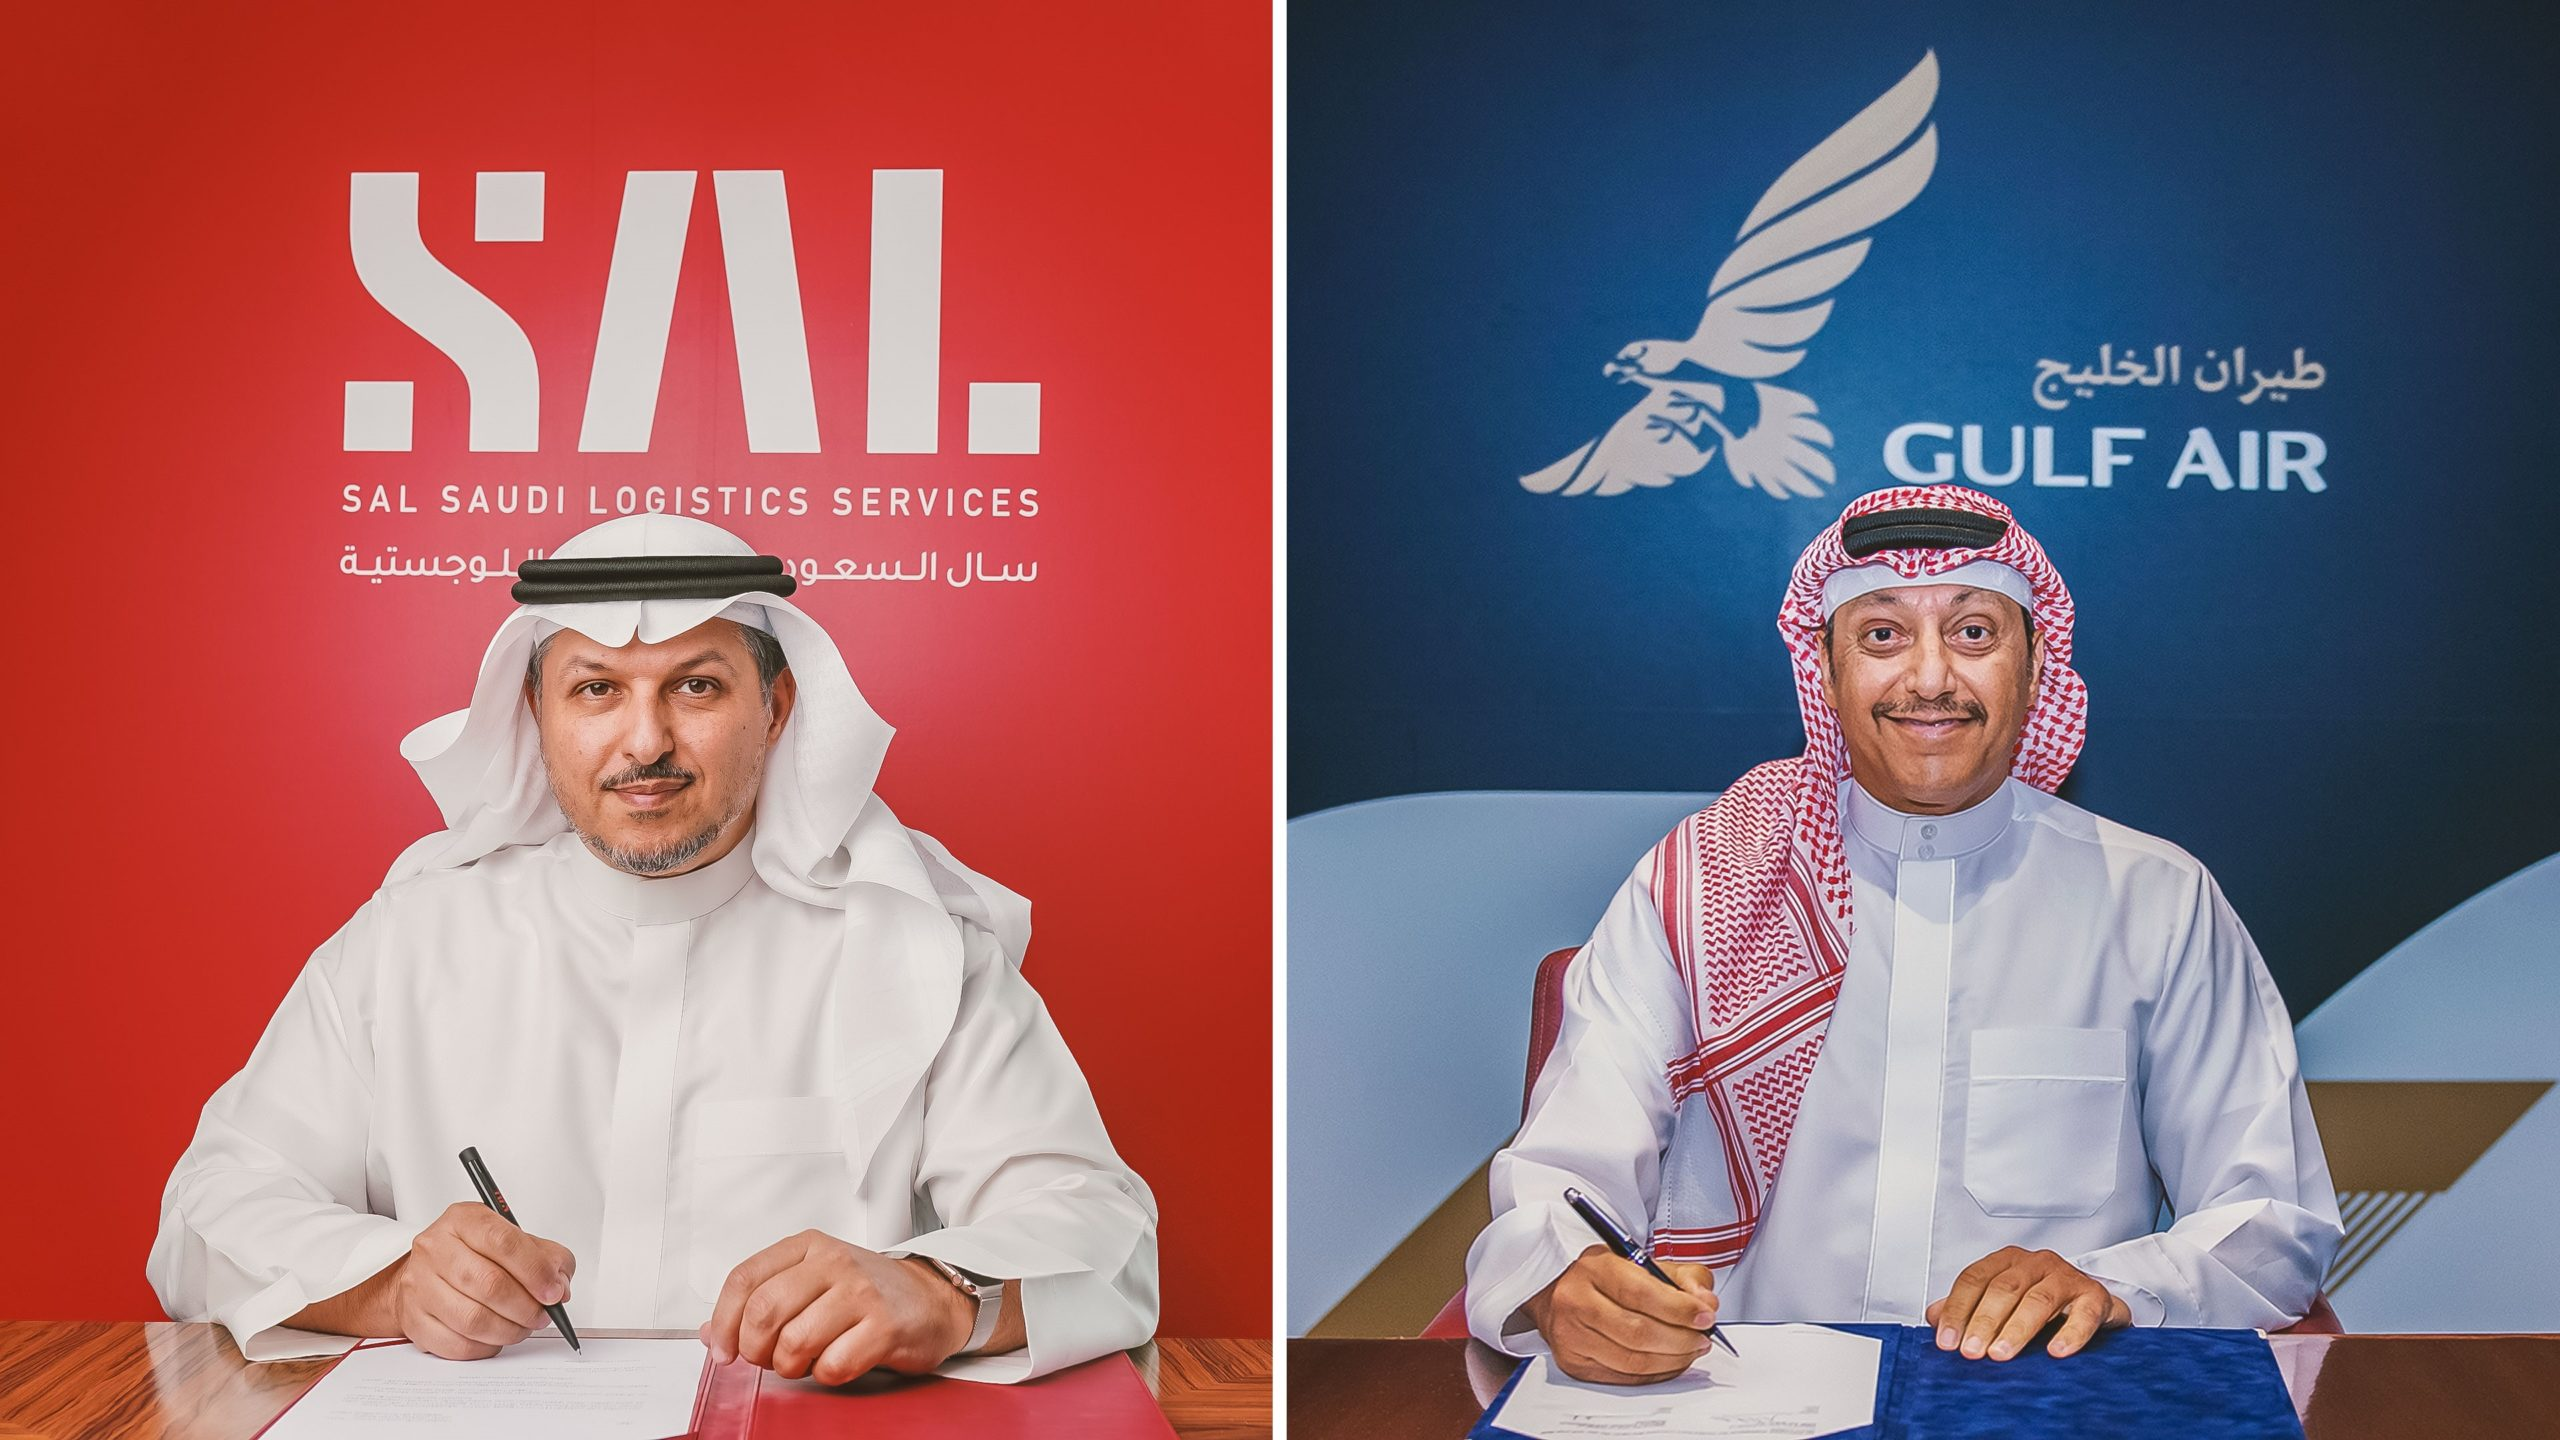 SAL and Bahrain's gulf air sign 7 year cargo logistics partnership